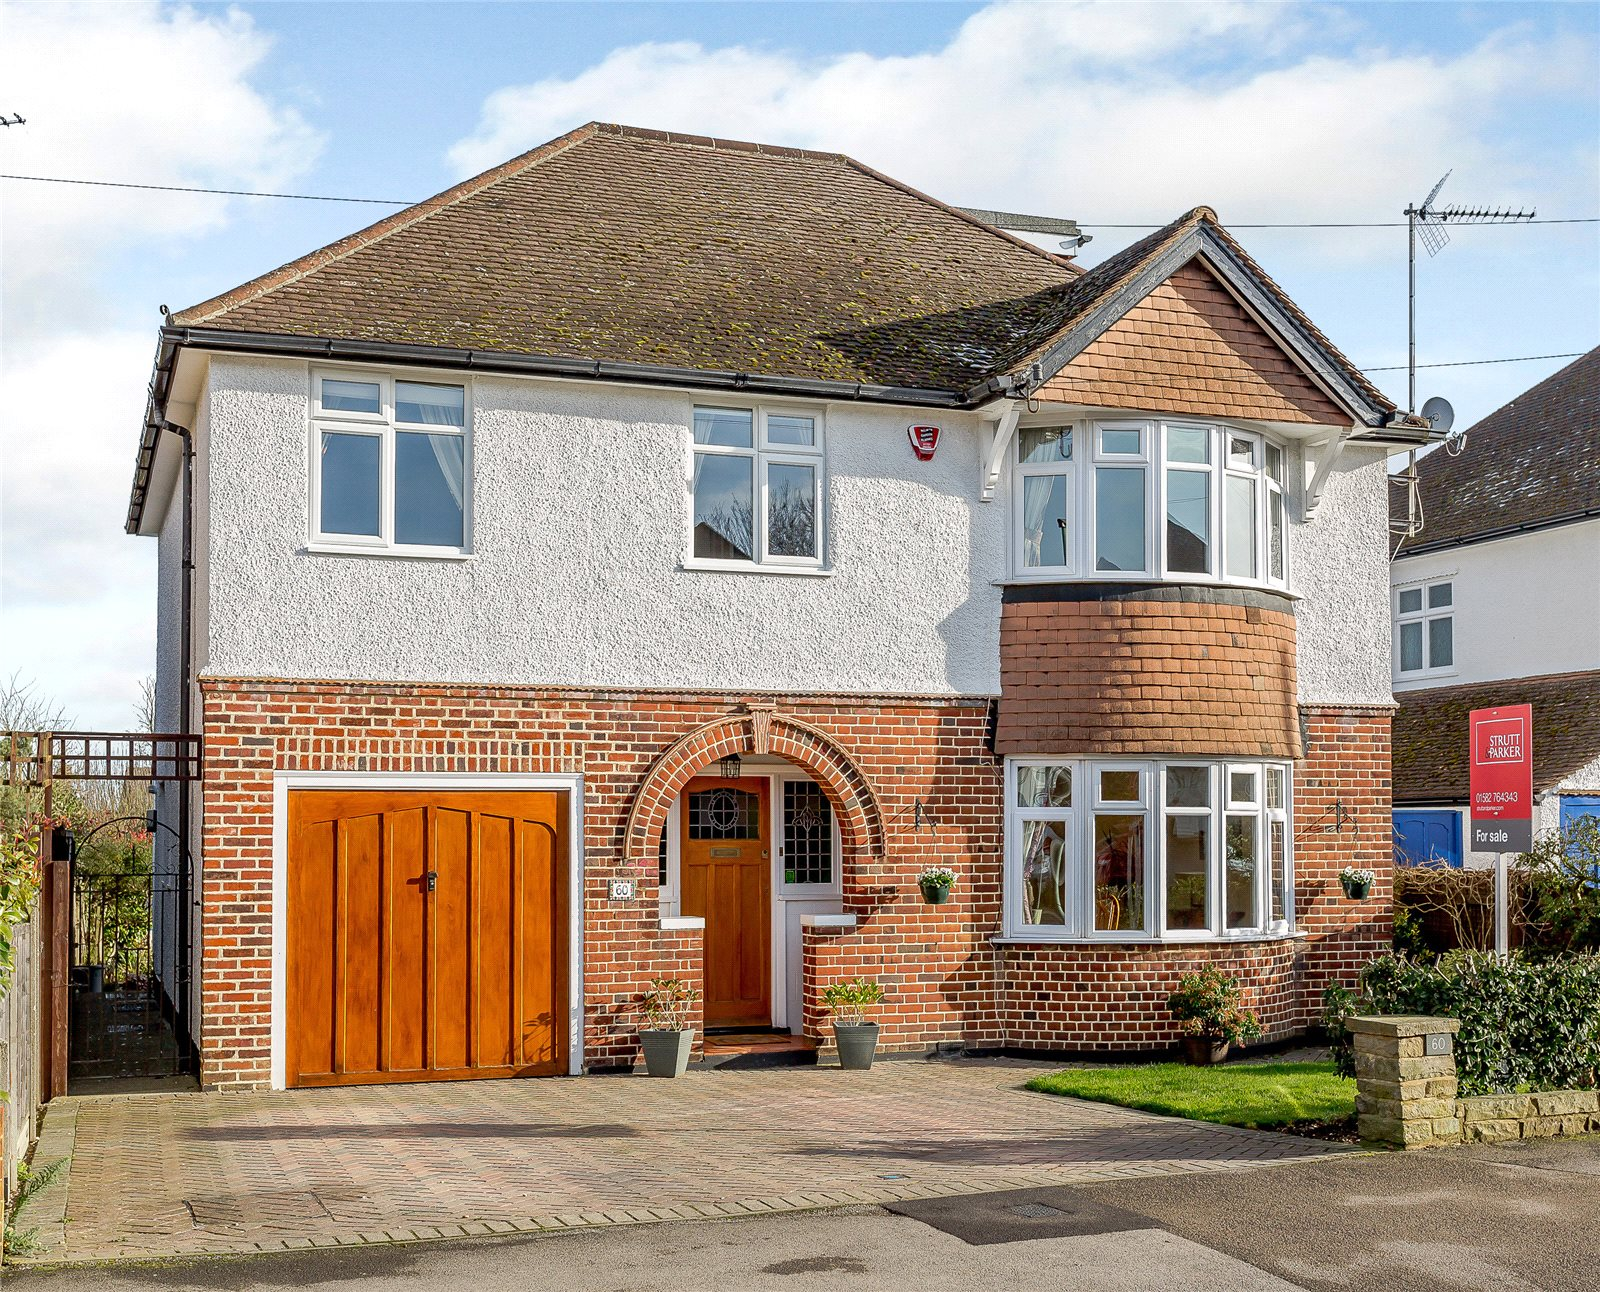 Single Family Home for Sale at Dalkeith Road, Harpenden, Hertfordshire, AL5 Harpenden, England